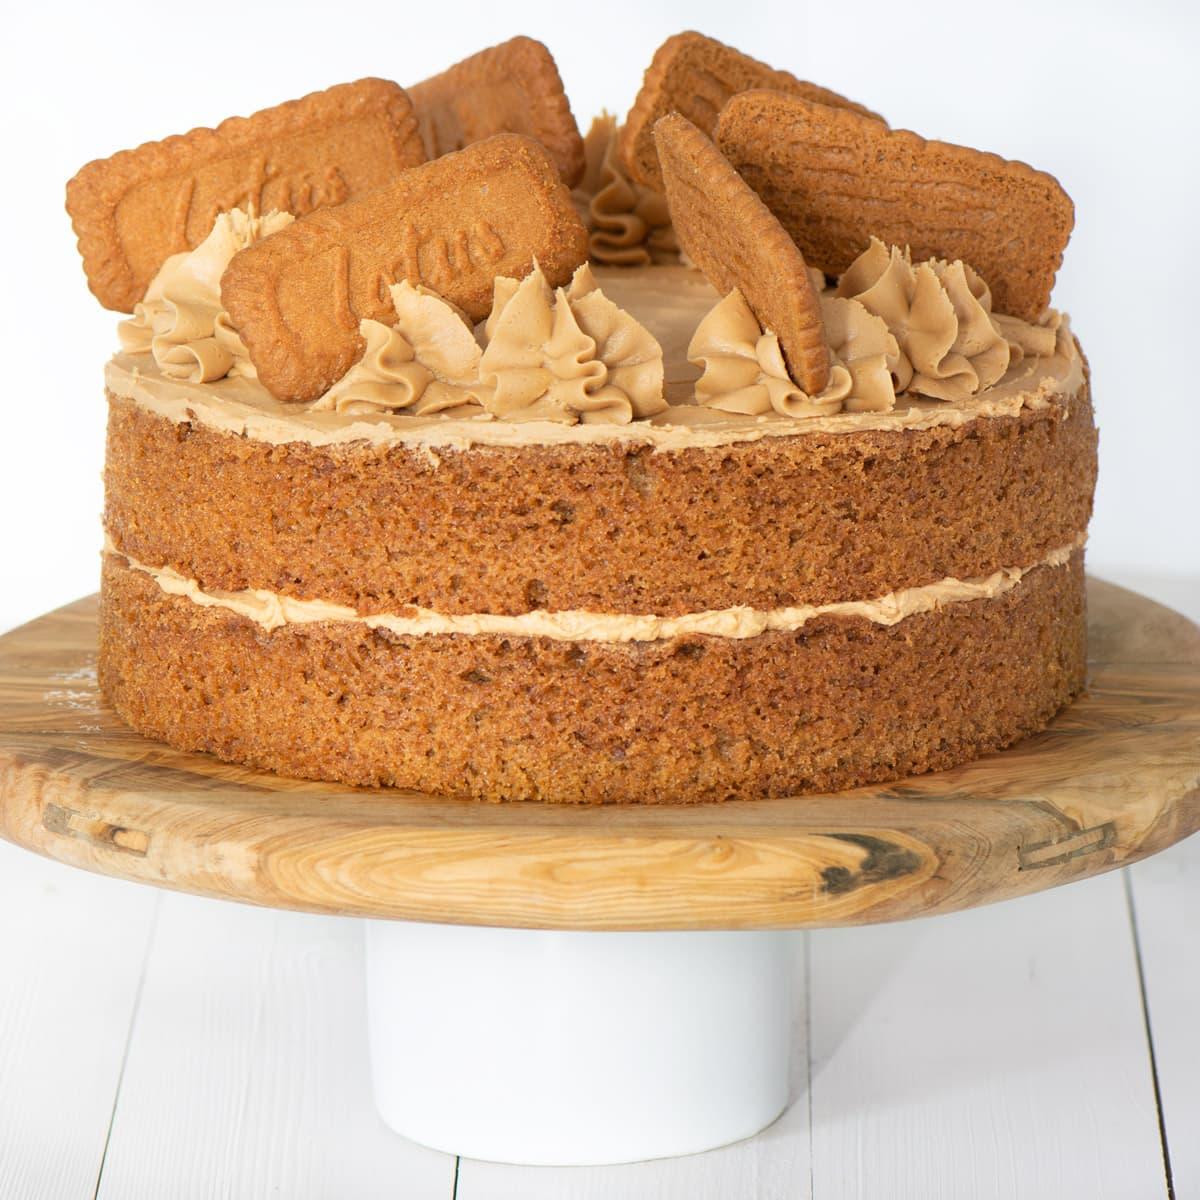 Biscoff cake on a cake stand.